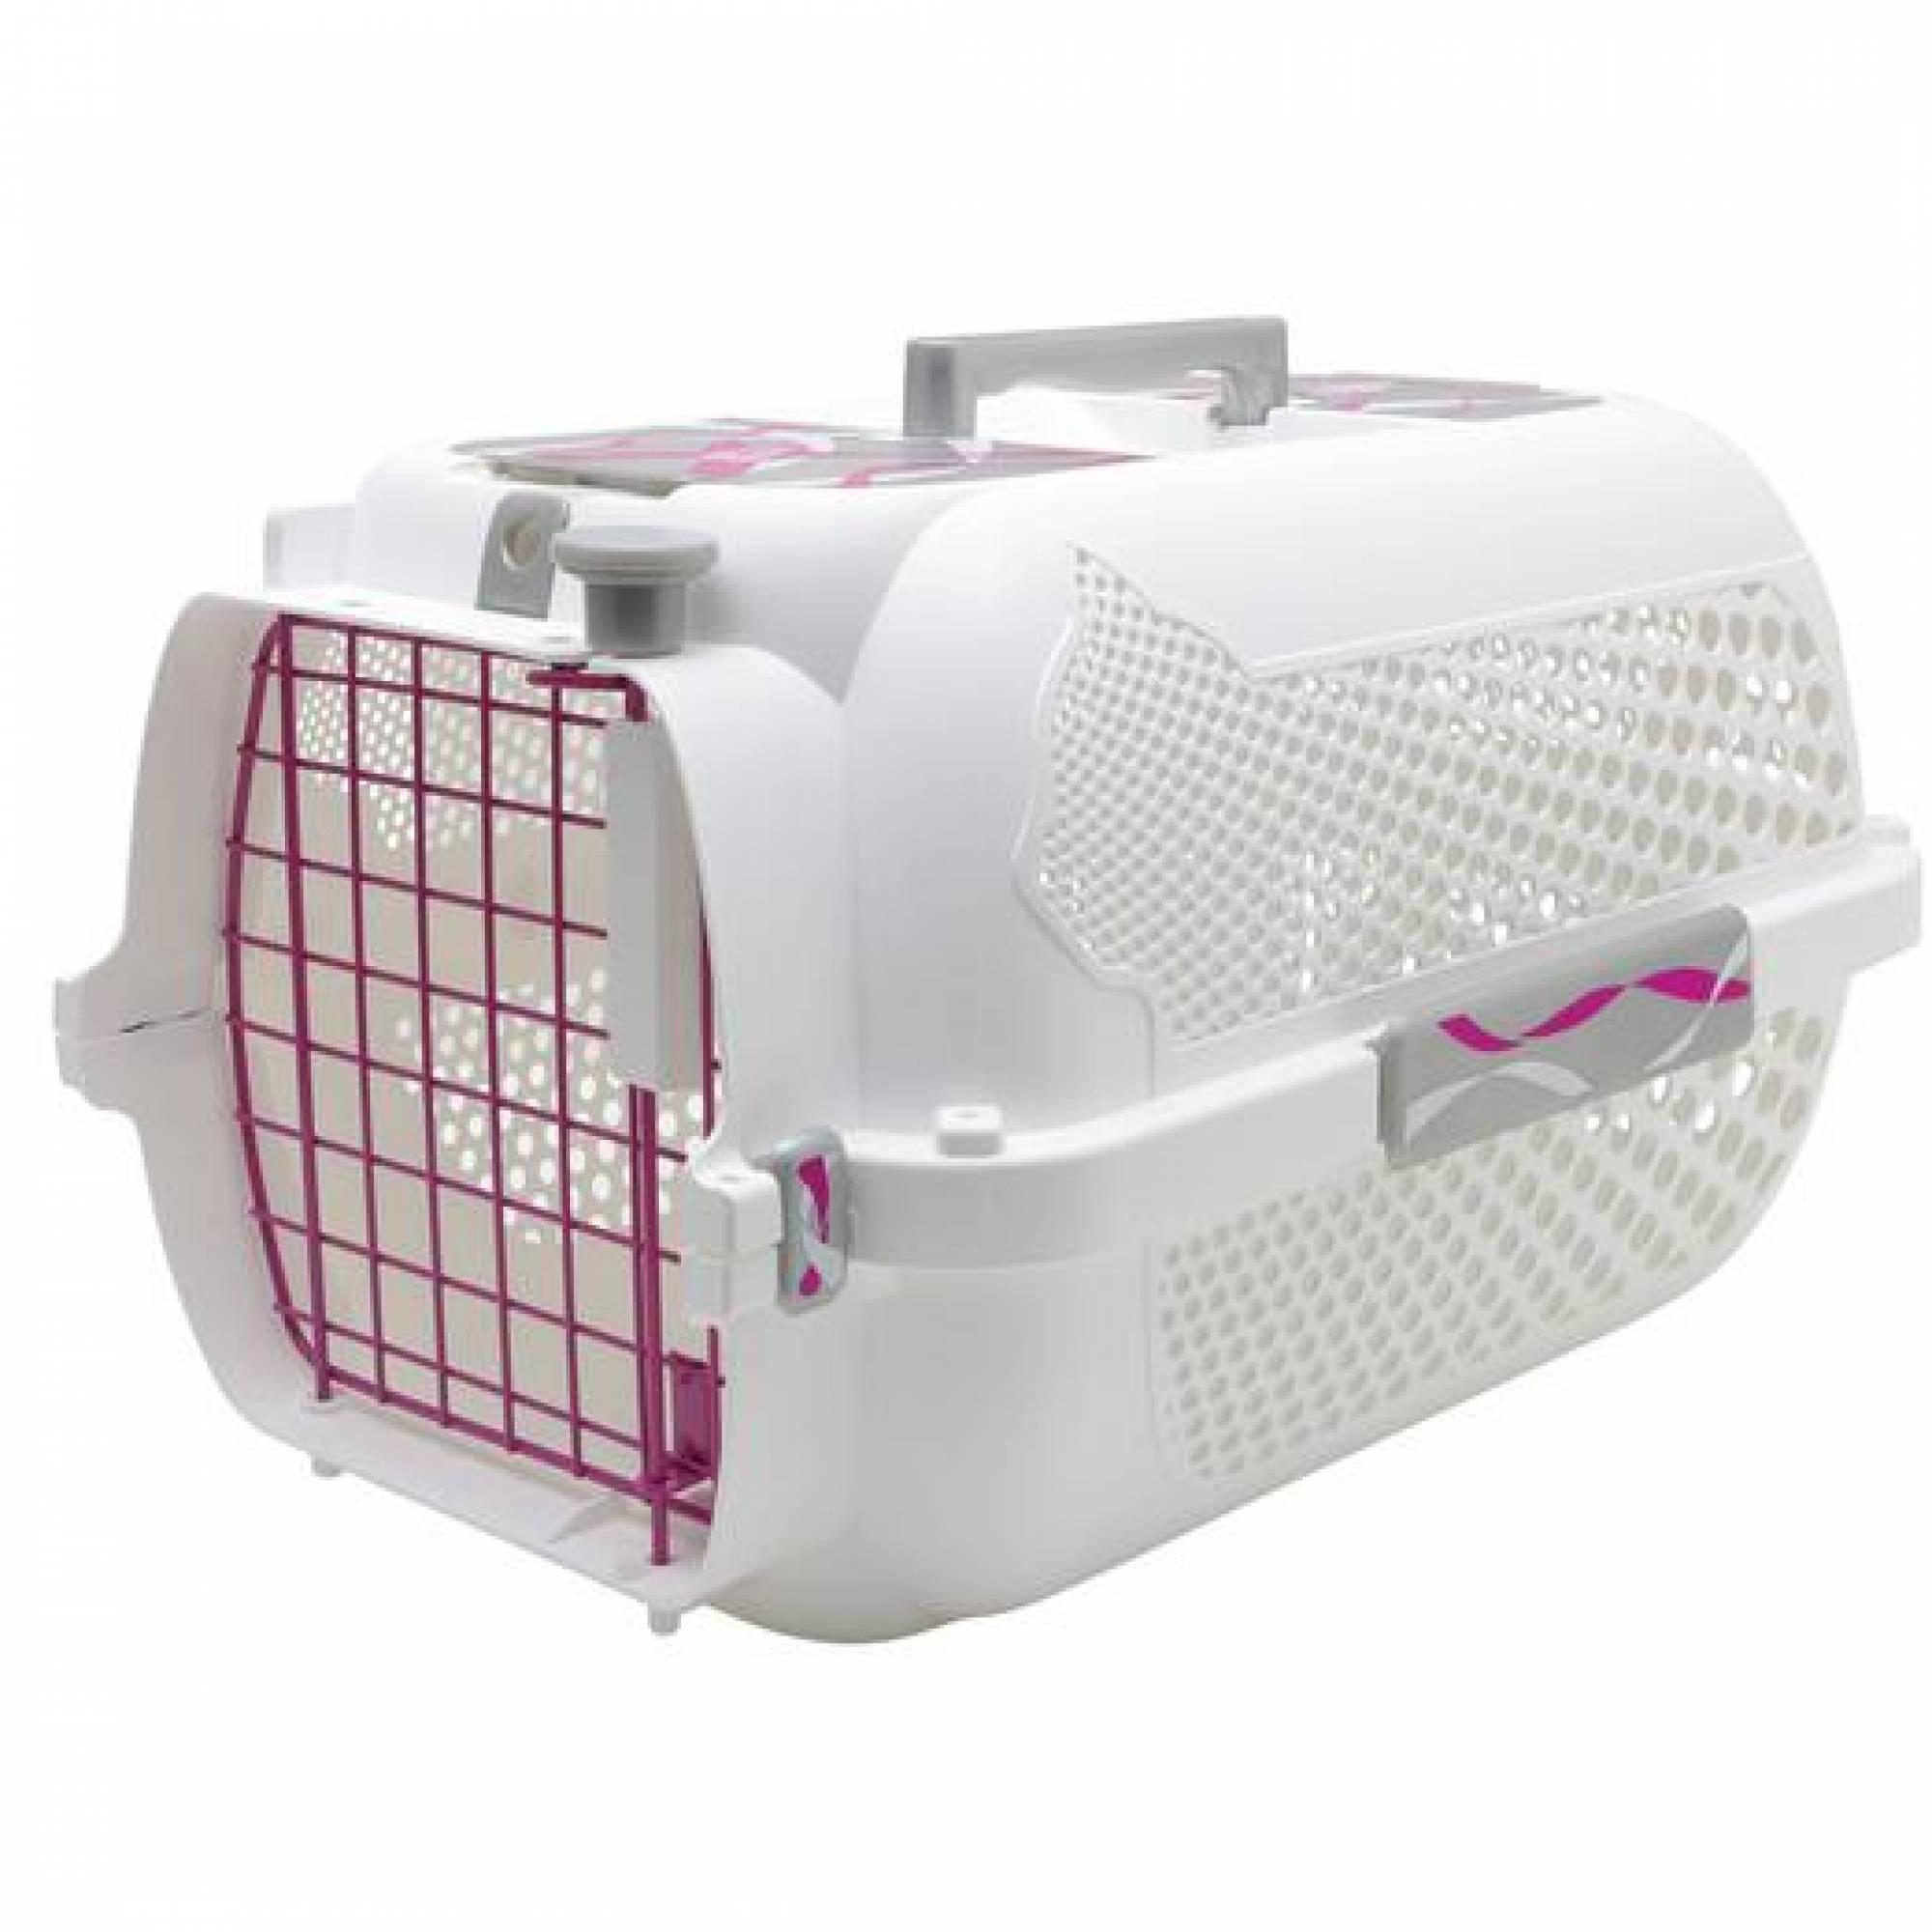 Catit New Pet Carrier 100 Pink